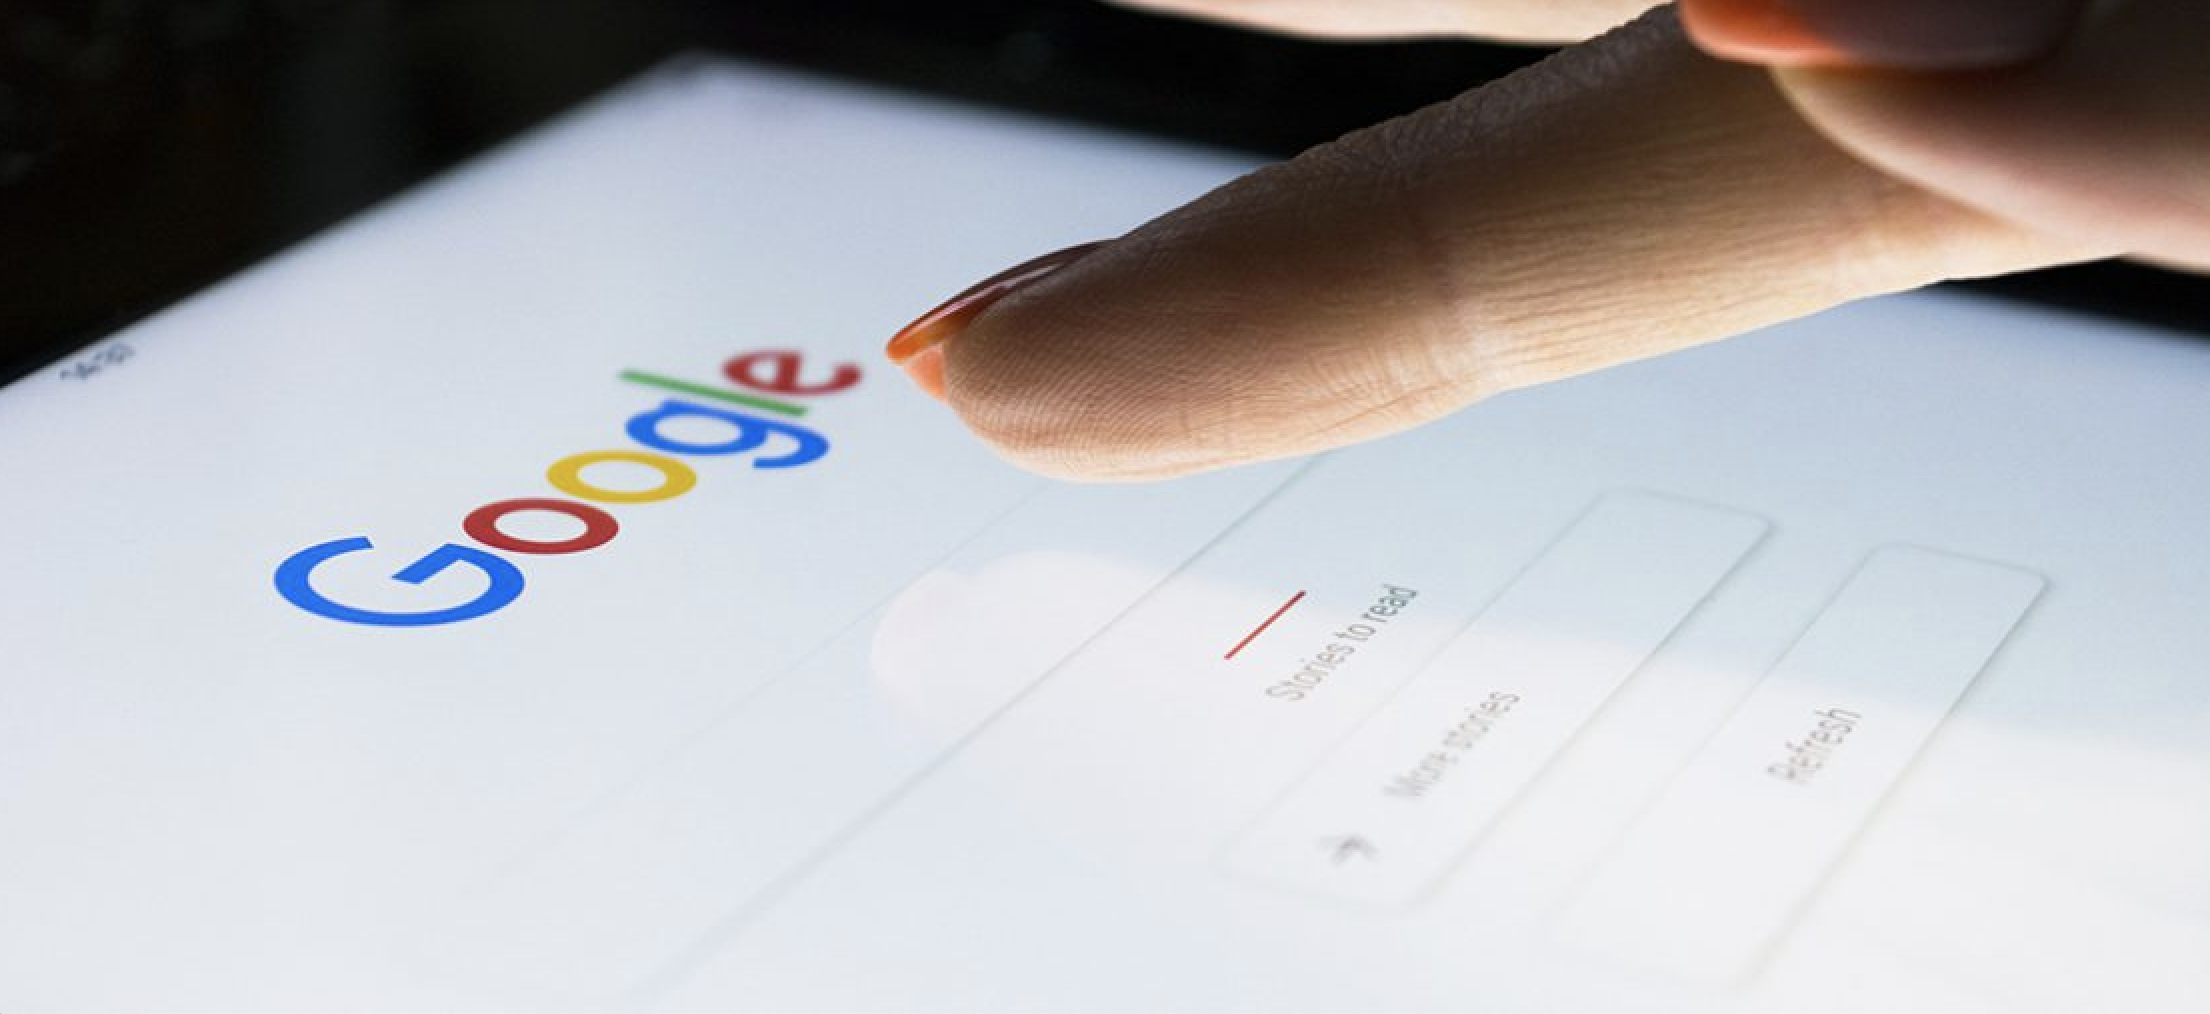 Google Search Engine Optimization image for The Rojas Group, Las Vegas TRGLV